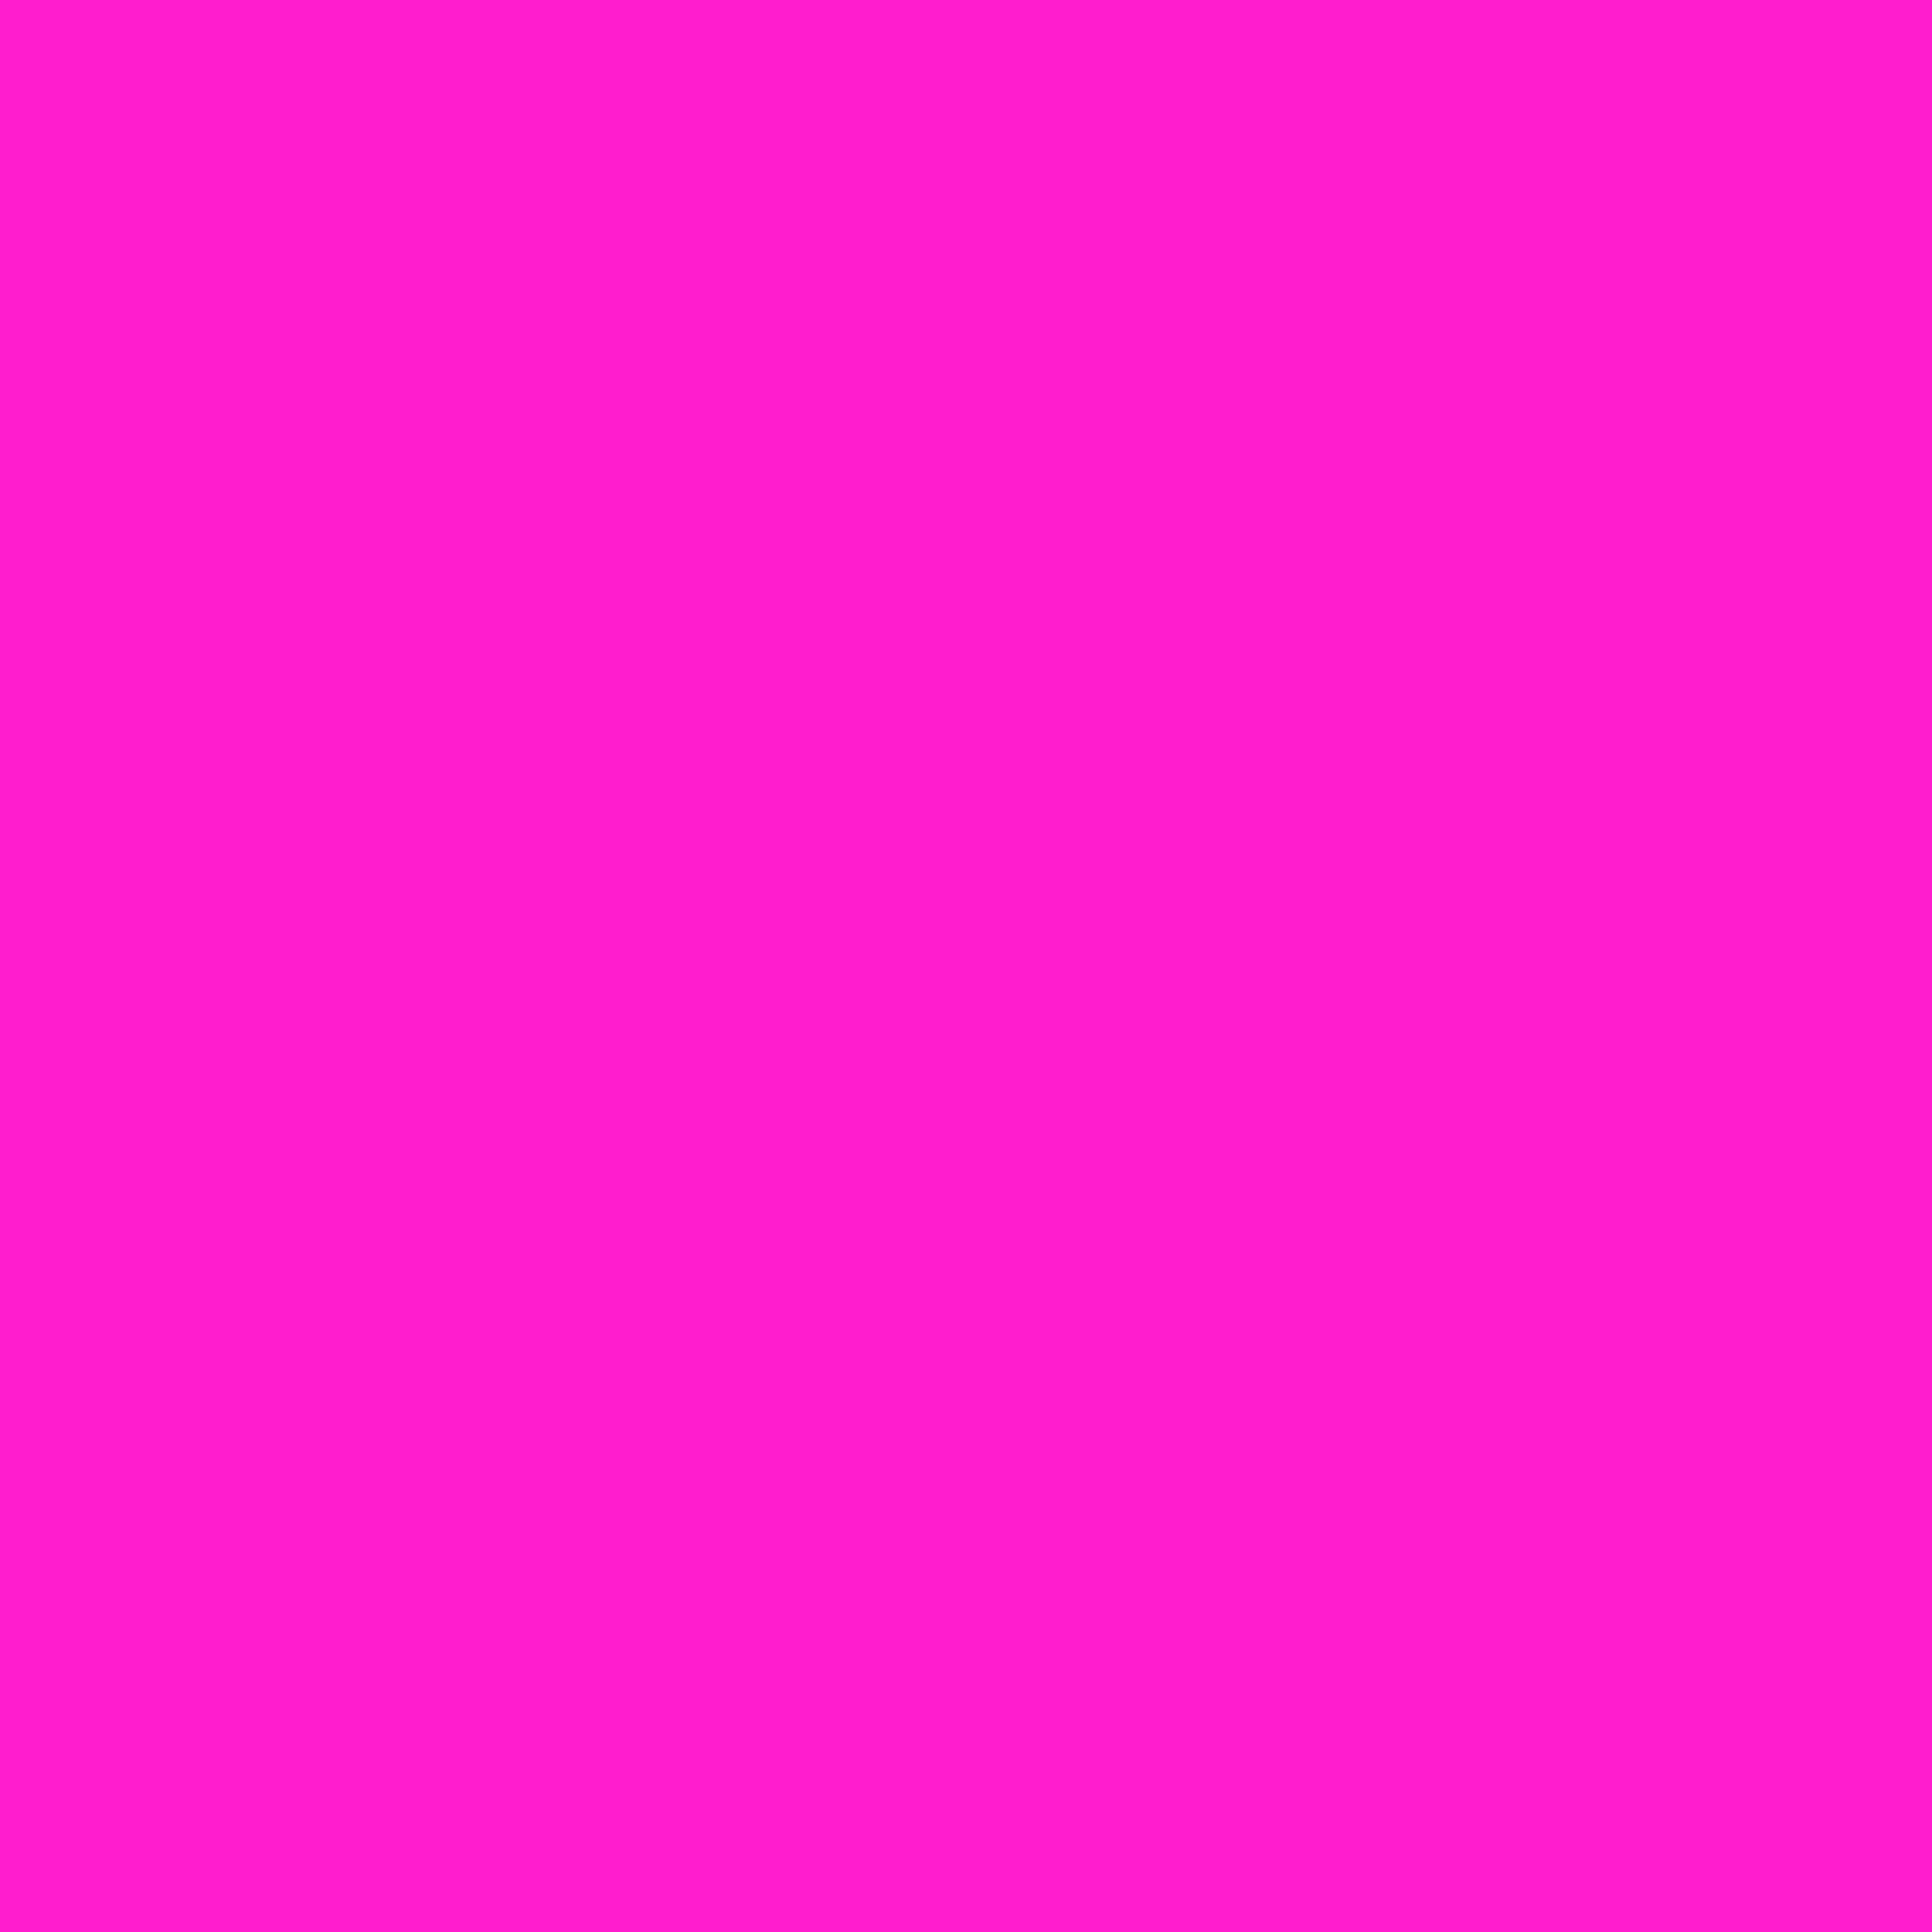 3600x3600 Hot Magenta Solid Color Background